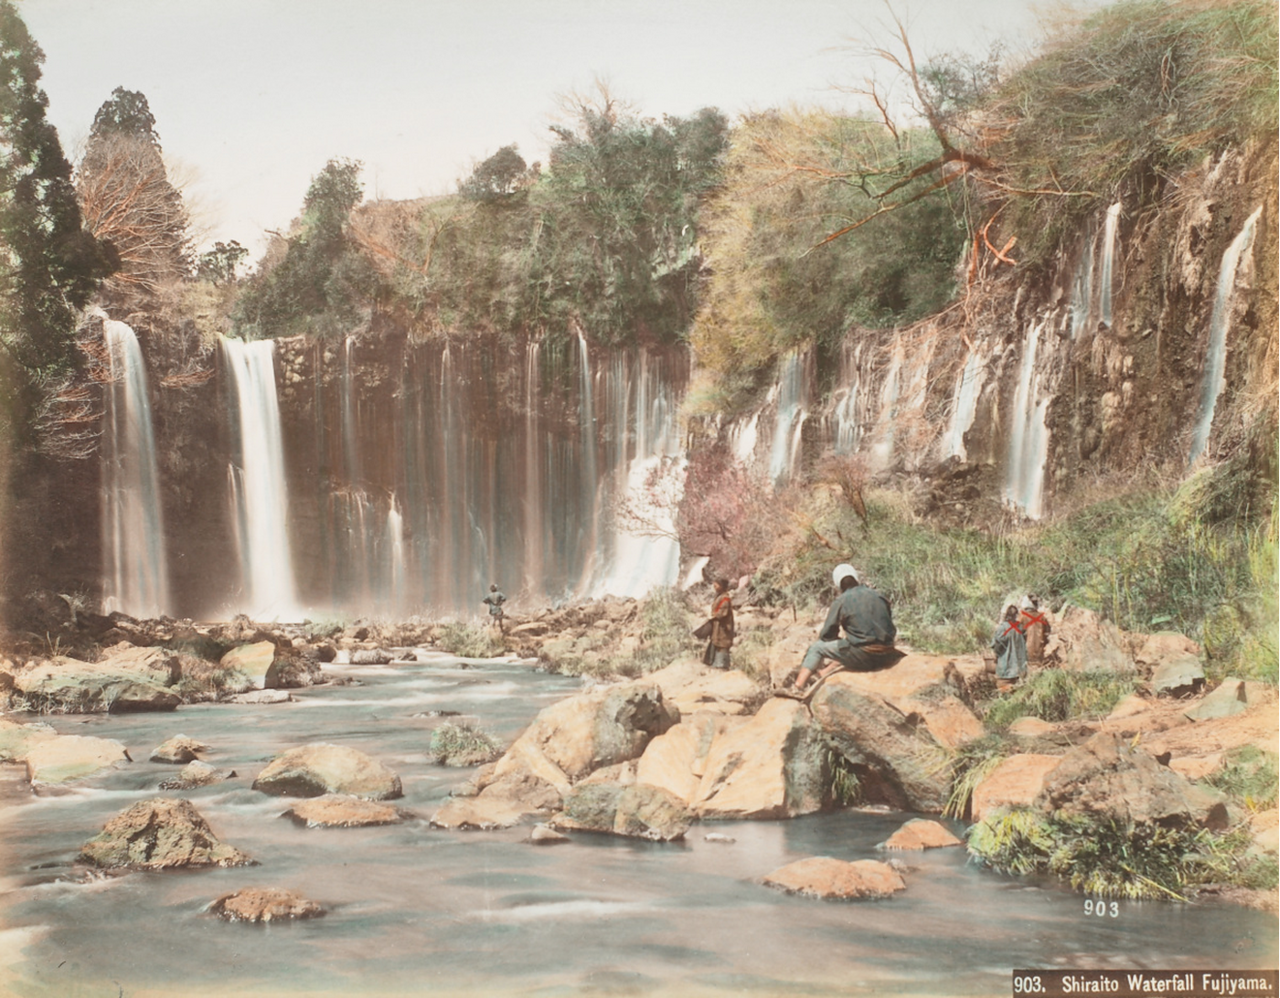 Фудзияма. Водопад Шираито